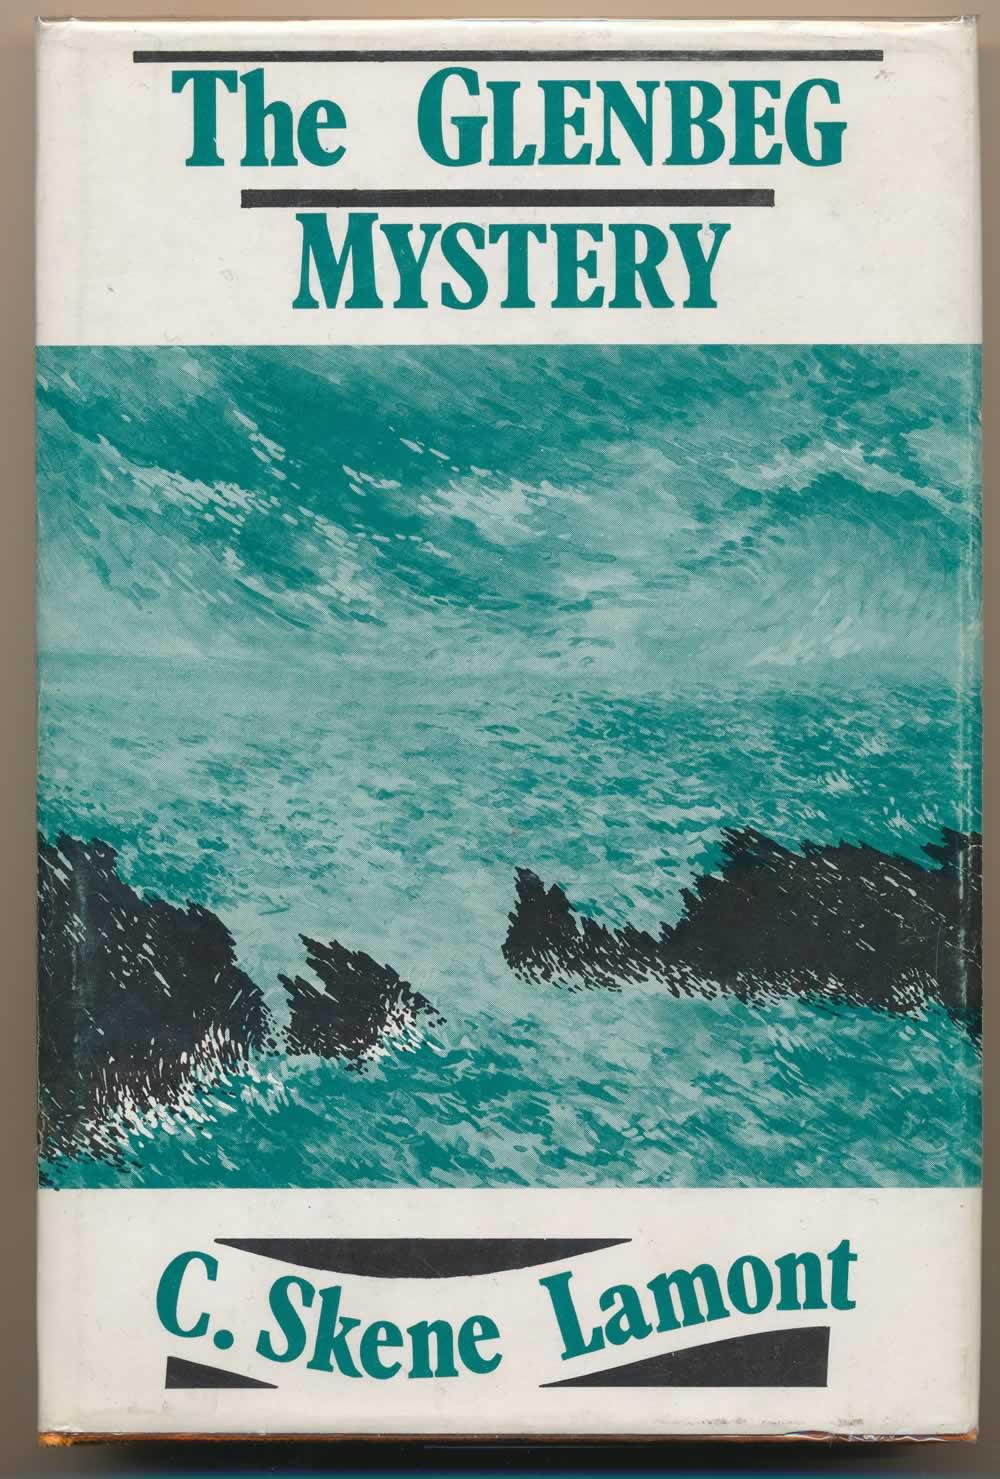 The Glenbeg mystery